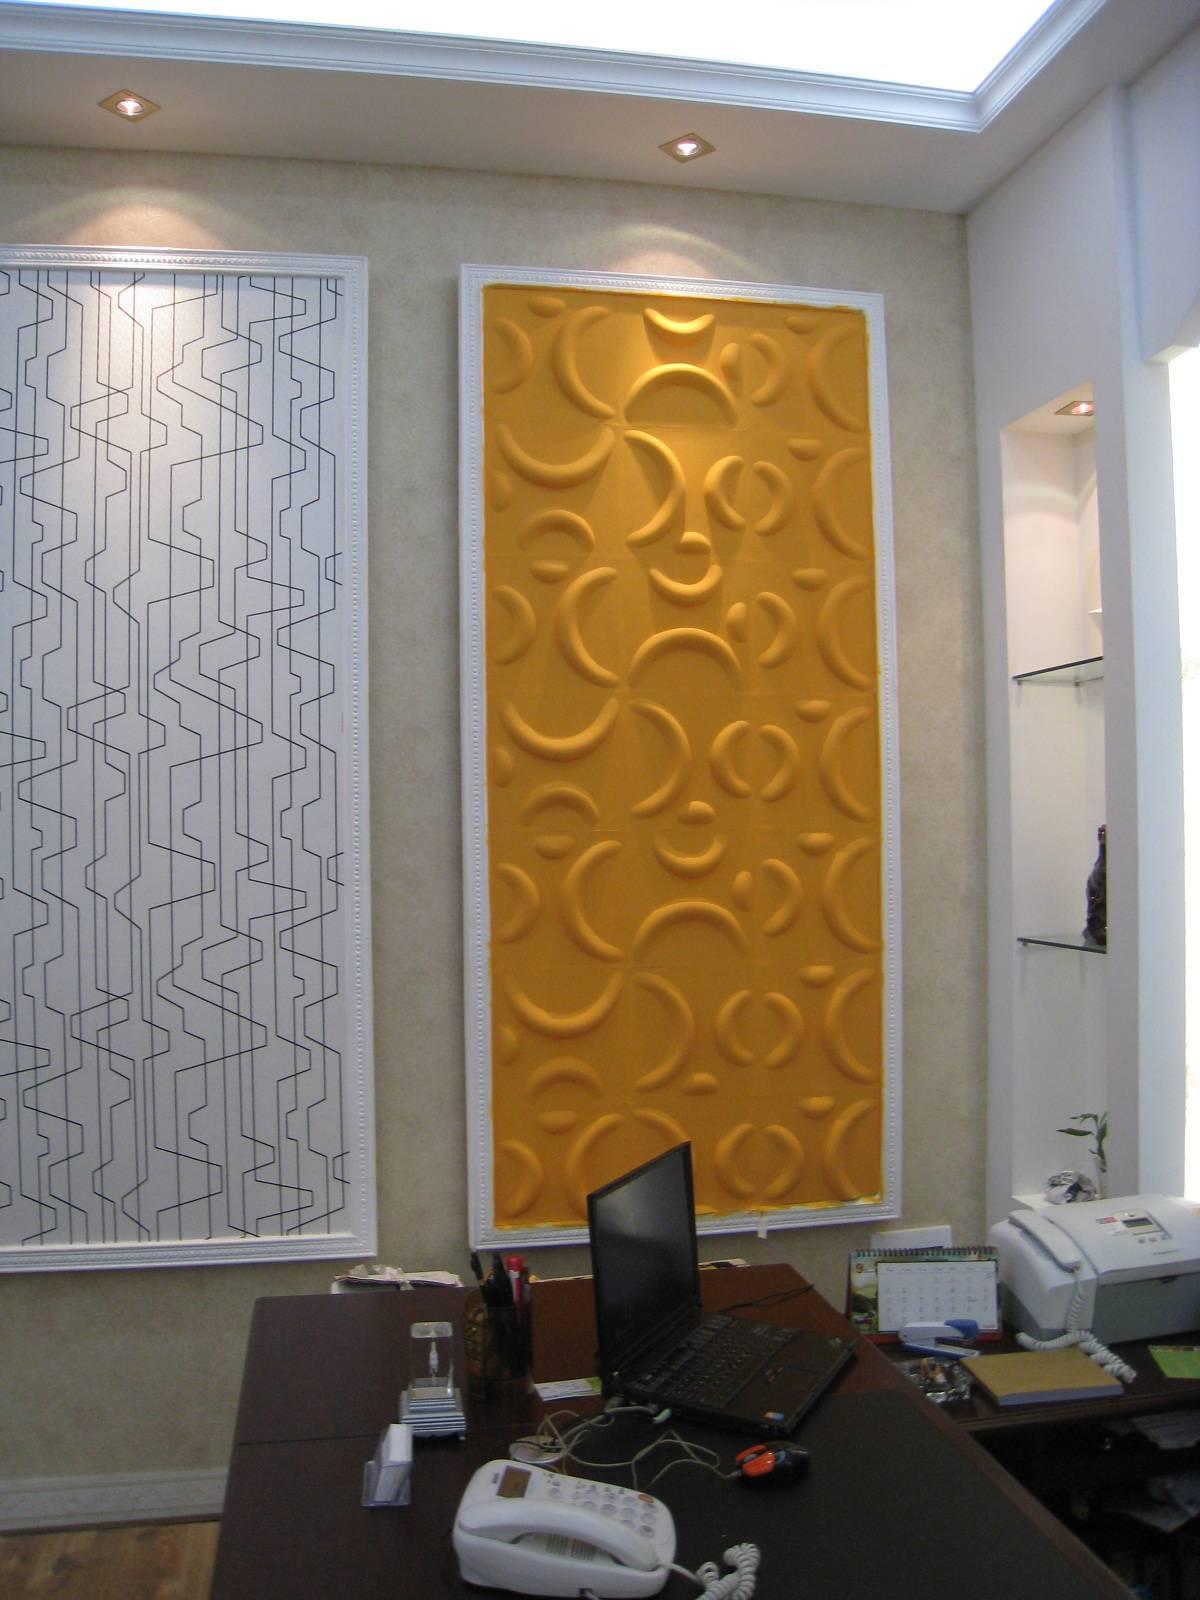 fshion design 3D wall panel